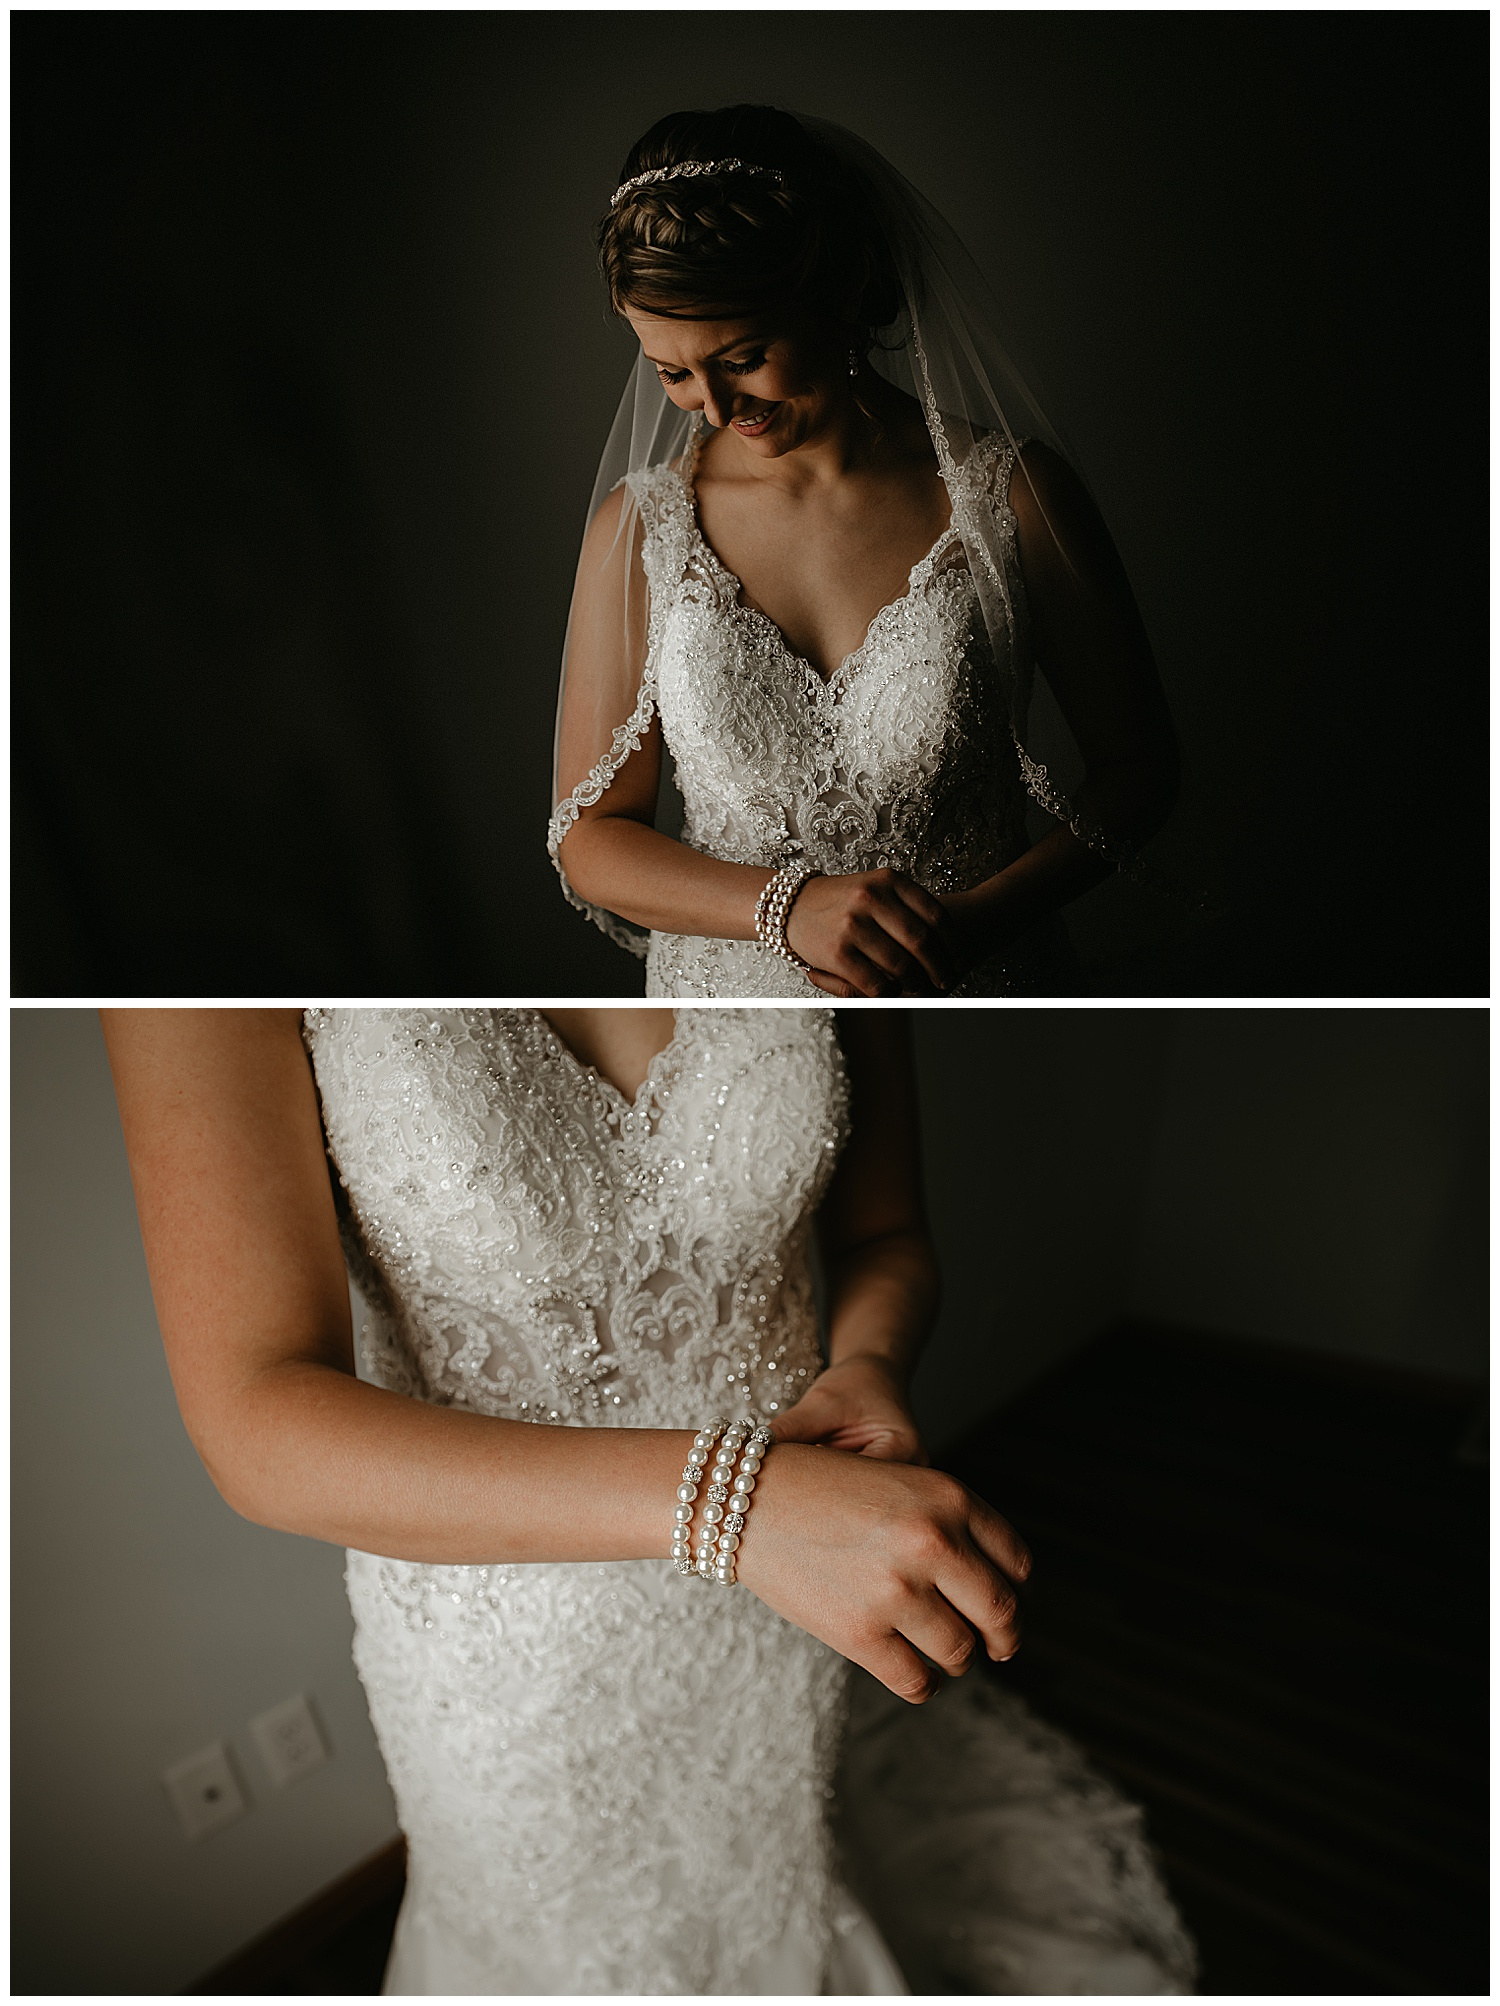 NEPA-Lehigh-Valley-Wedding-Photographer-at-Fountain-Springs-Country-Inn-Ashland-PA_0010.jpg